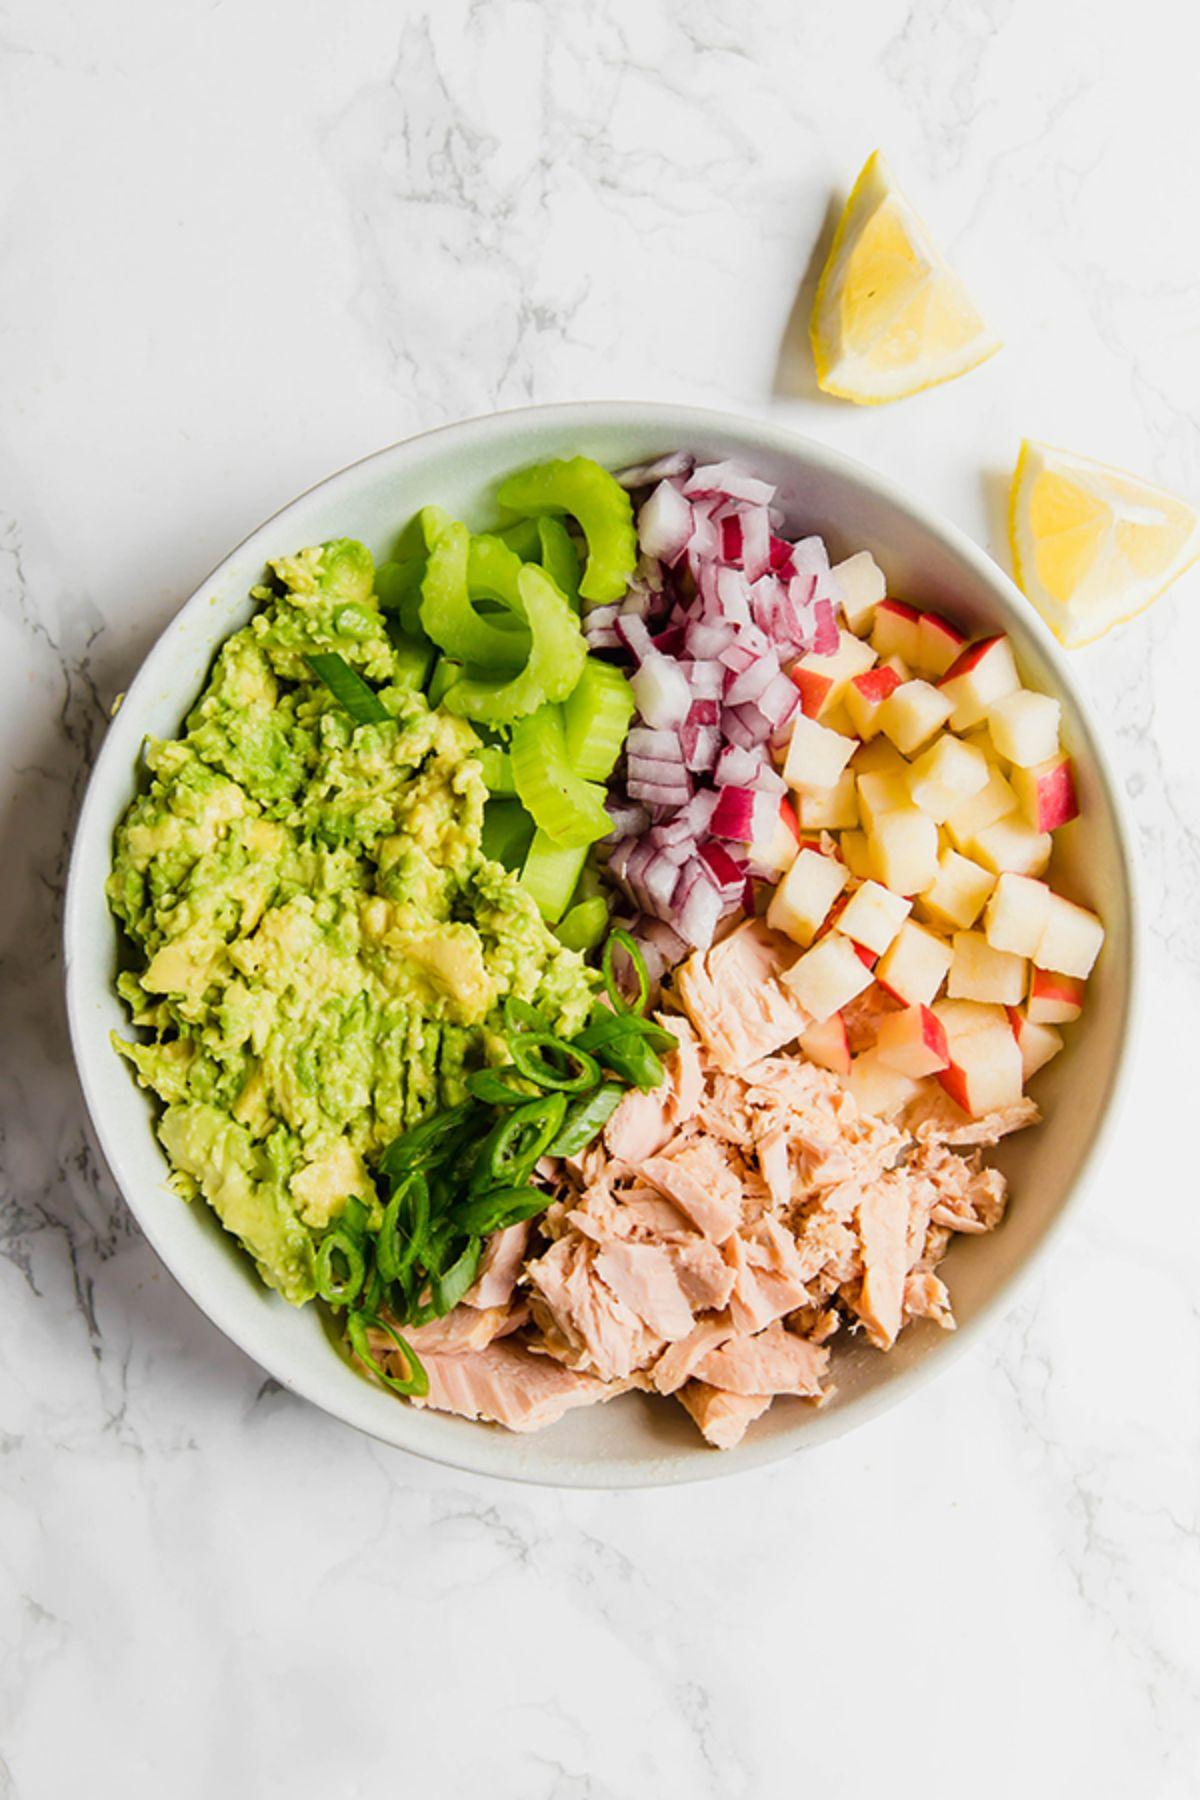 a bowl of avocado tuna salad with lemon wedges on the side